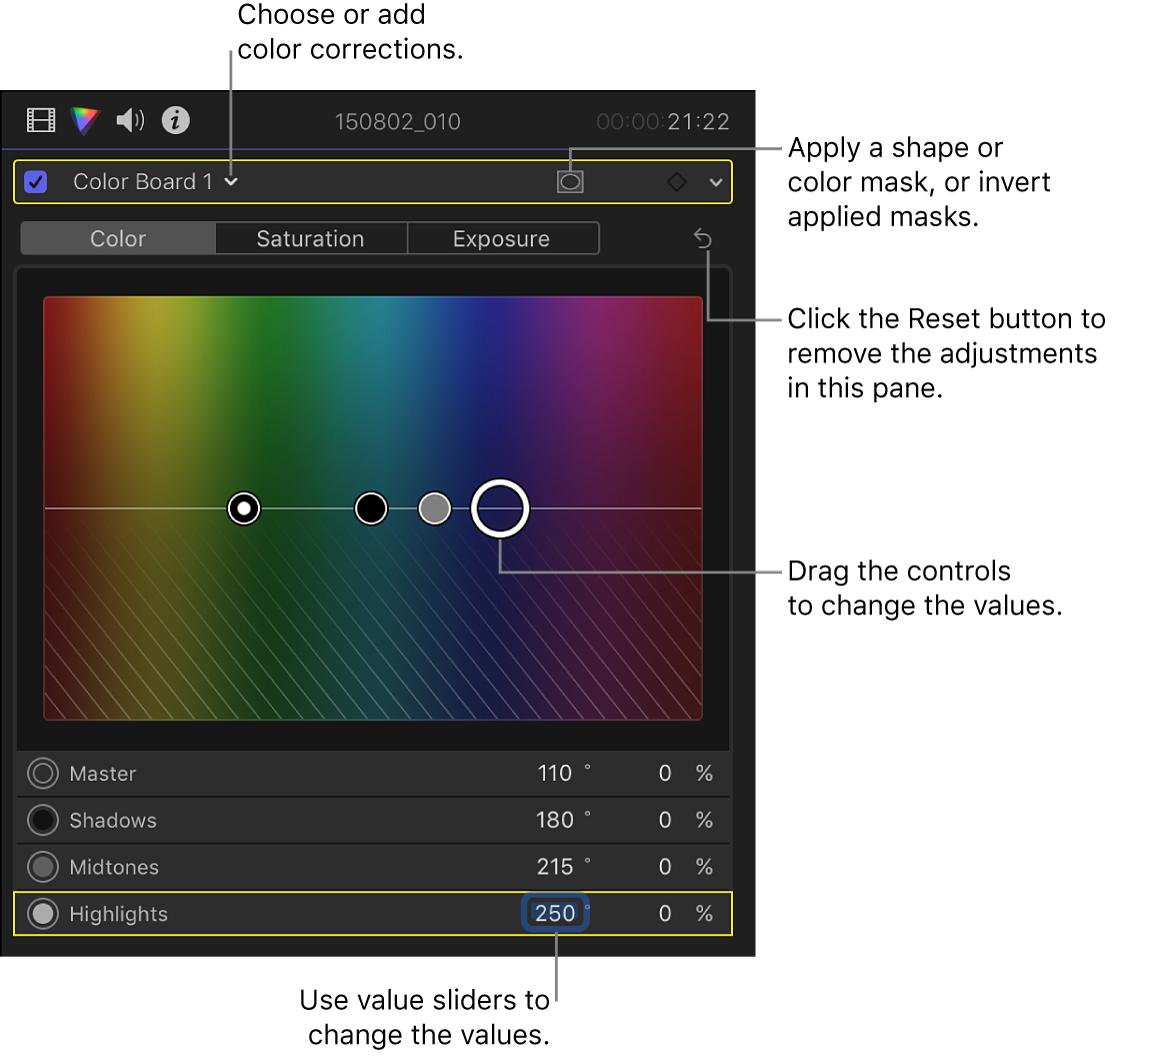 Controls in the Color Board